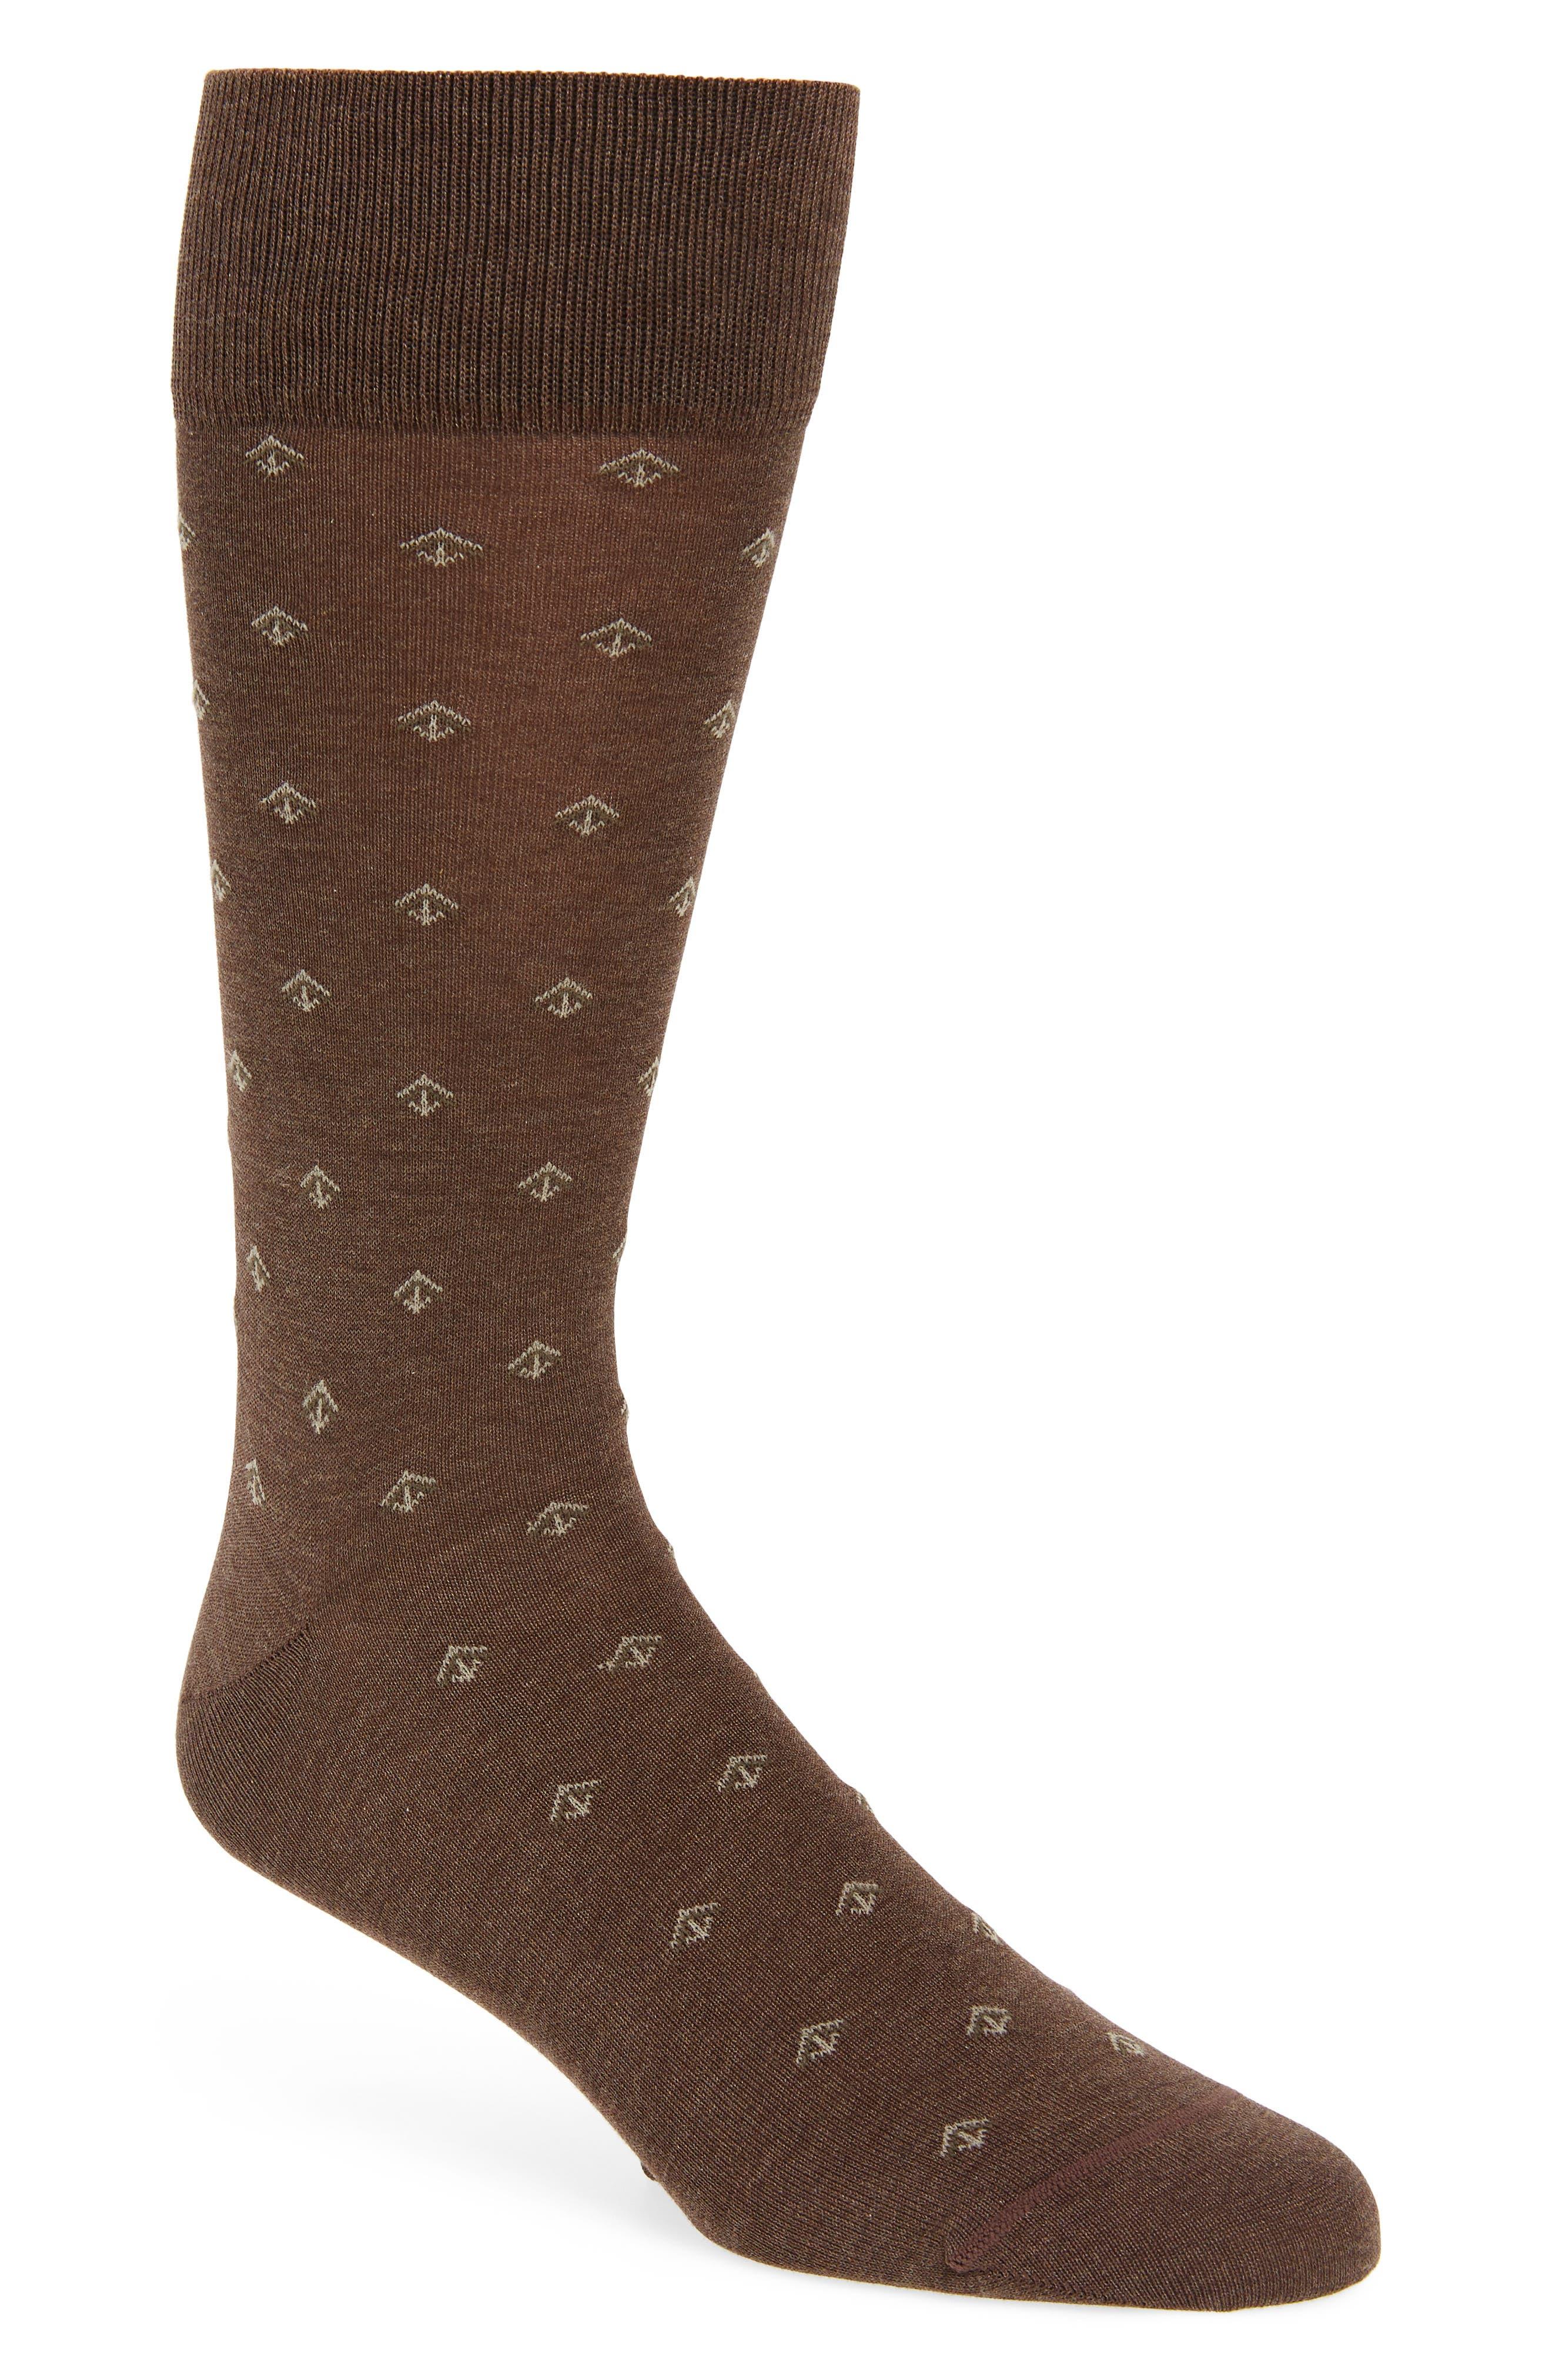 John W. Nordstrom® Cascading Arrows Socks